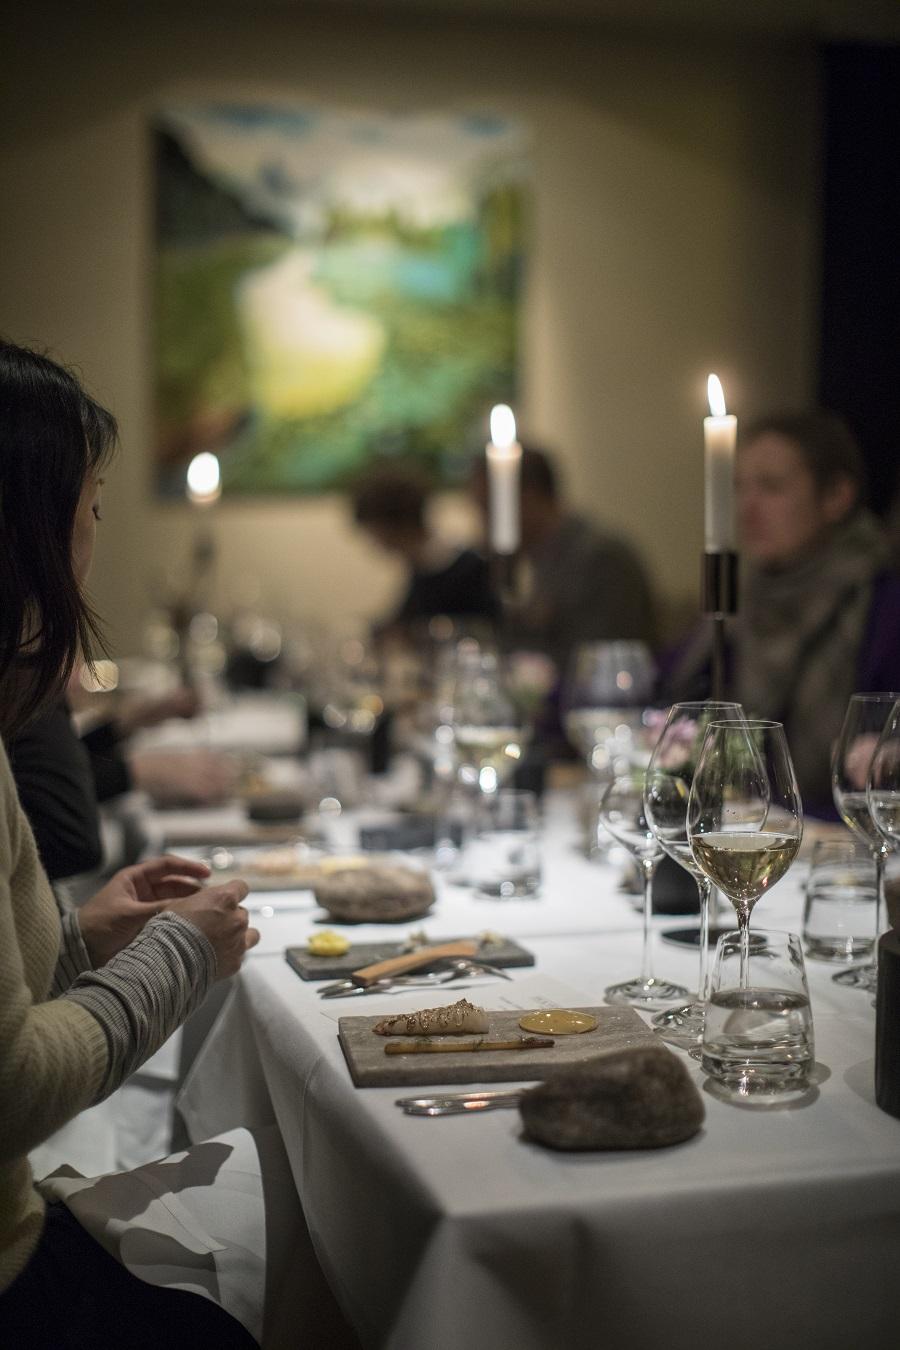 Introducing the Småland Region of Sweden - PM & Vanner Hotel